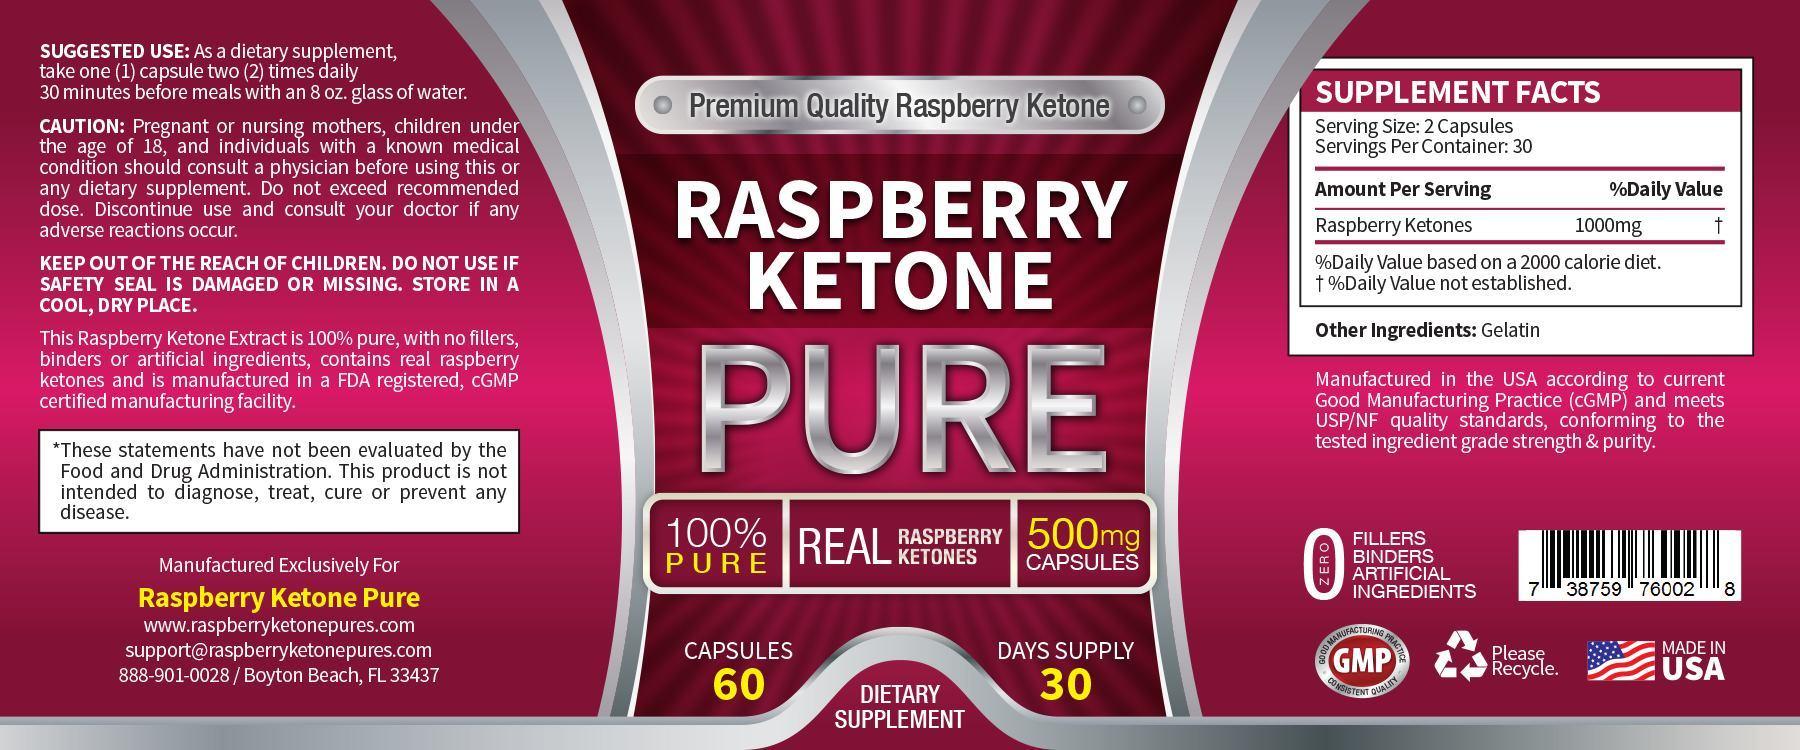 Raspberry Ketone Pure Tthe 1 Top Quality Raspberry Ketone